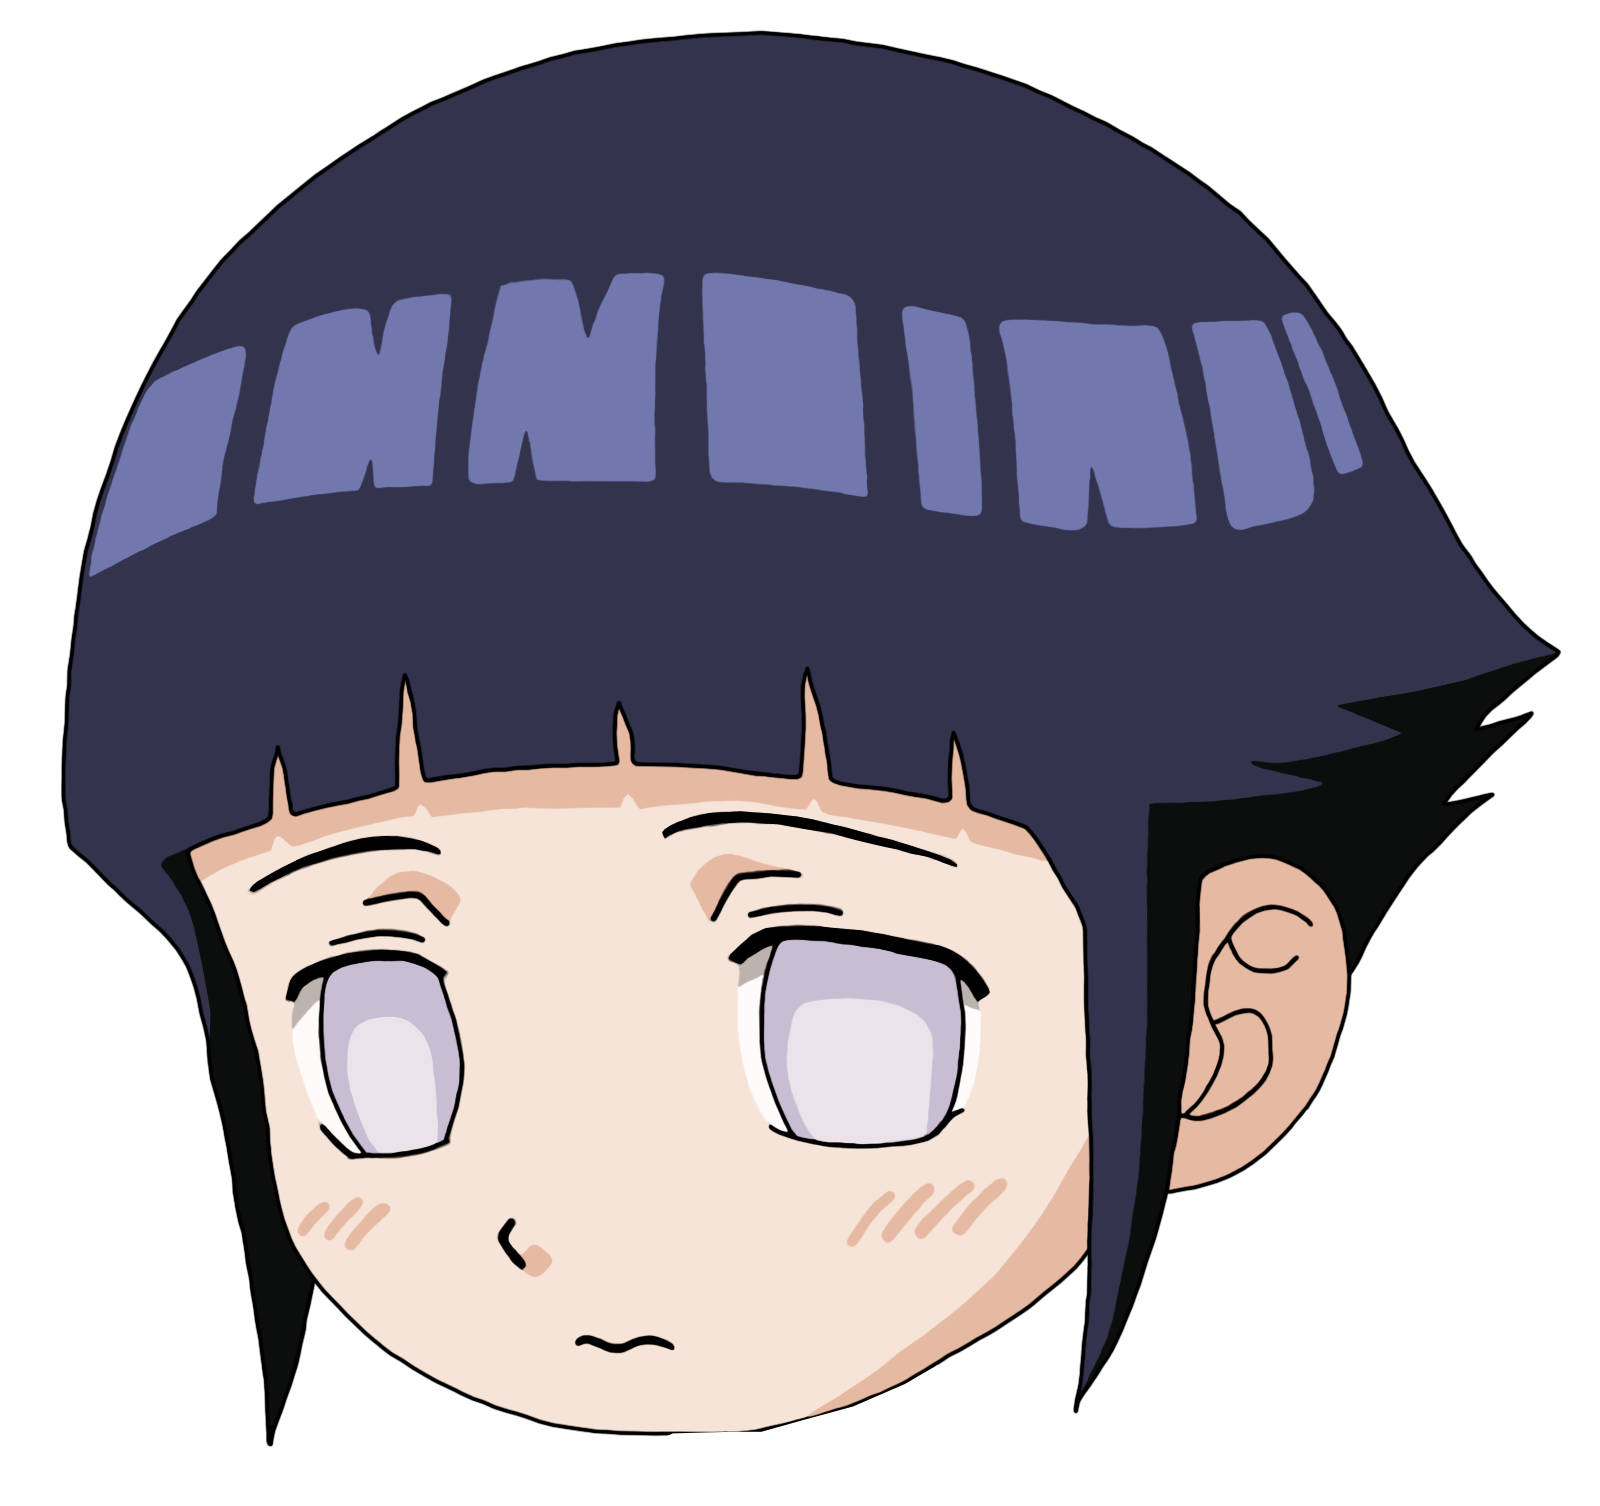 Gambar Mentahan Kepala Naruto Dan Kawan Kawan Png Dengan Gambar